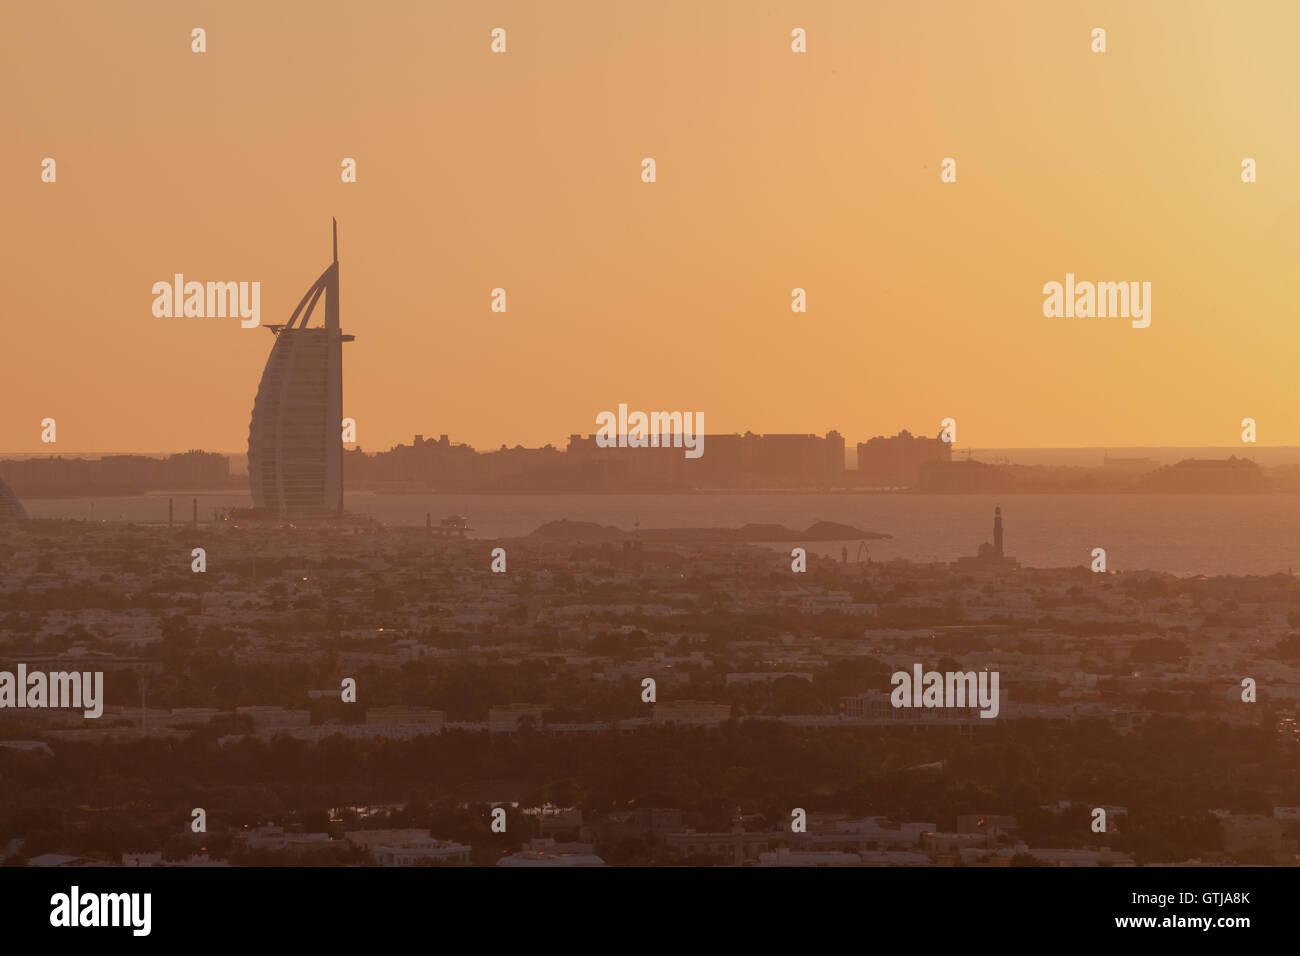 Burj Al Arab Luxus 7 Sterne Hotel und Jumeirah Strand im Sonnenuntergang Panorama orange silhouette Stockbild